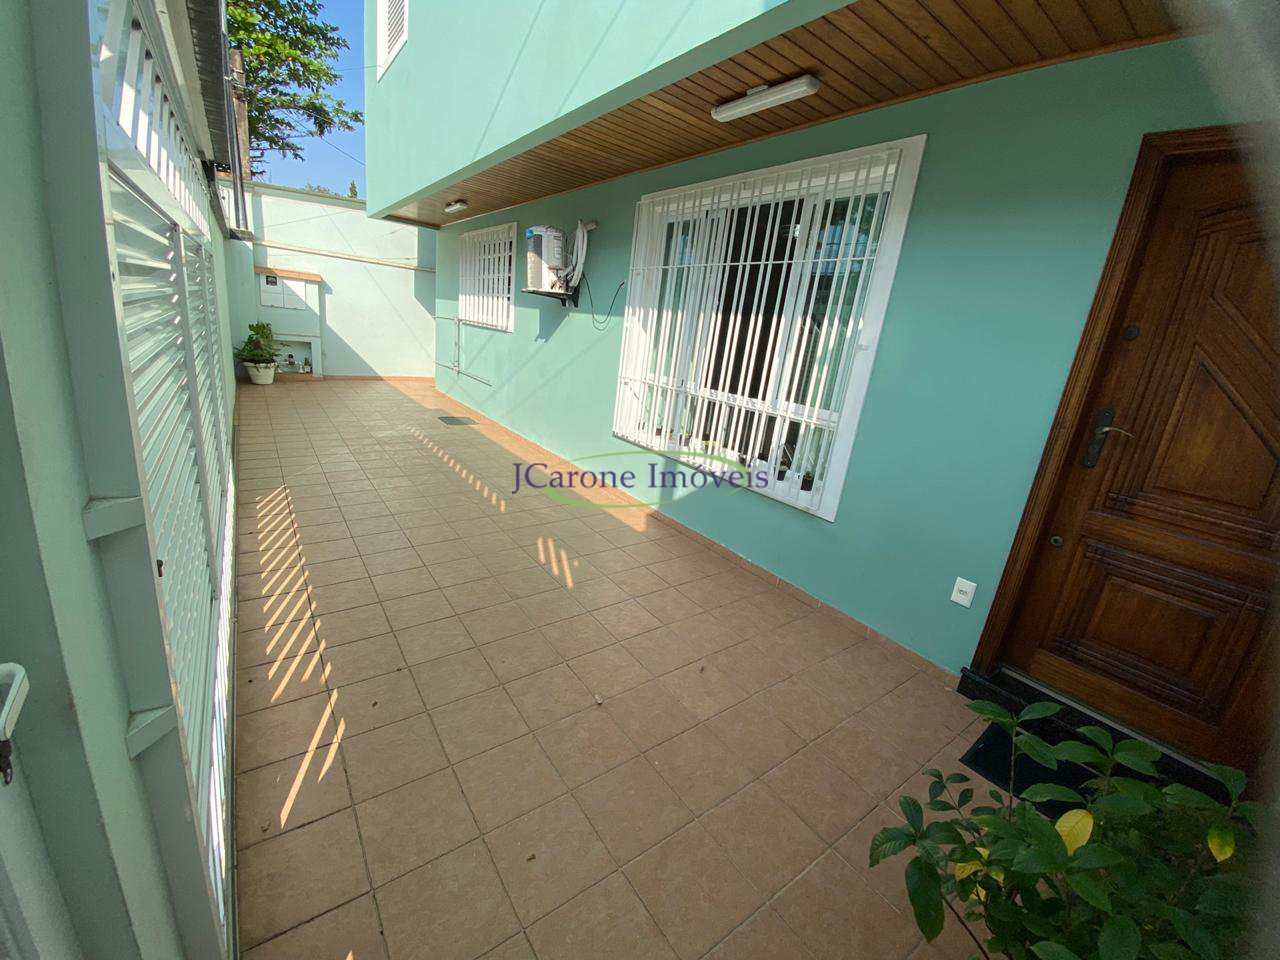 Casa com 3 dorms, Vila Belmiro, Santos - R$ 635 mil, Cod: 64152452